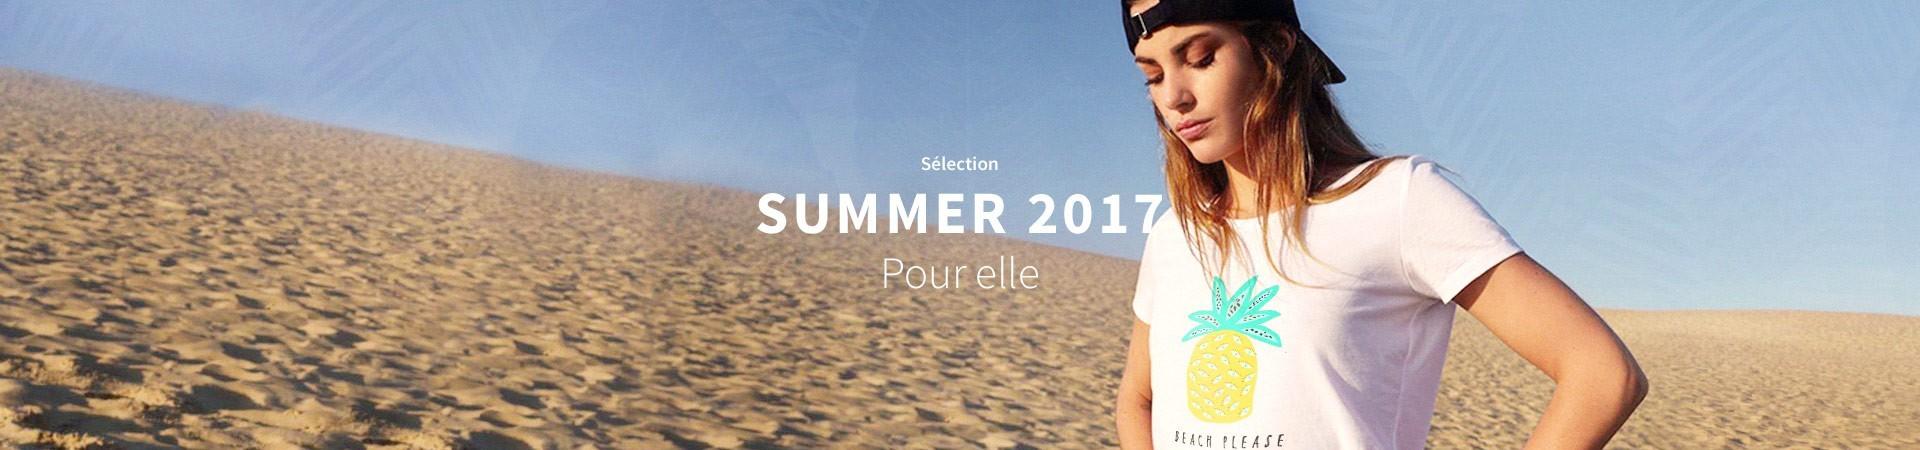 Summer 2016 - Femmes